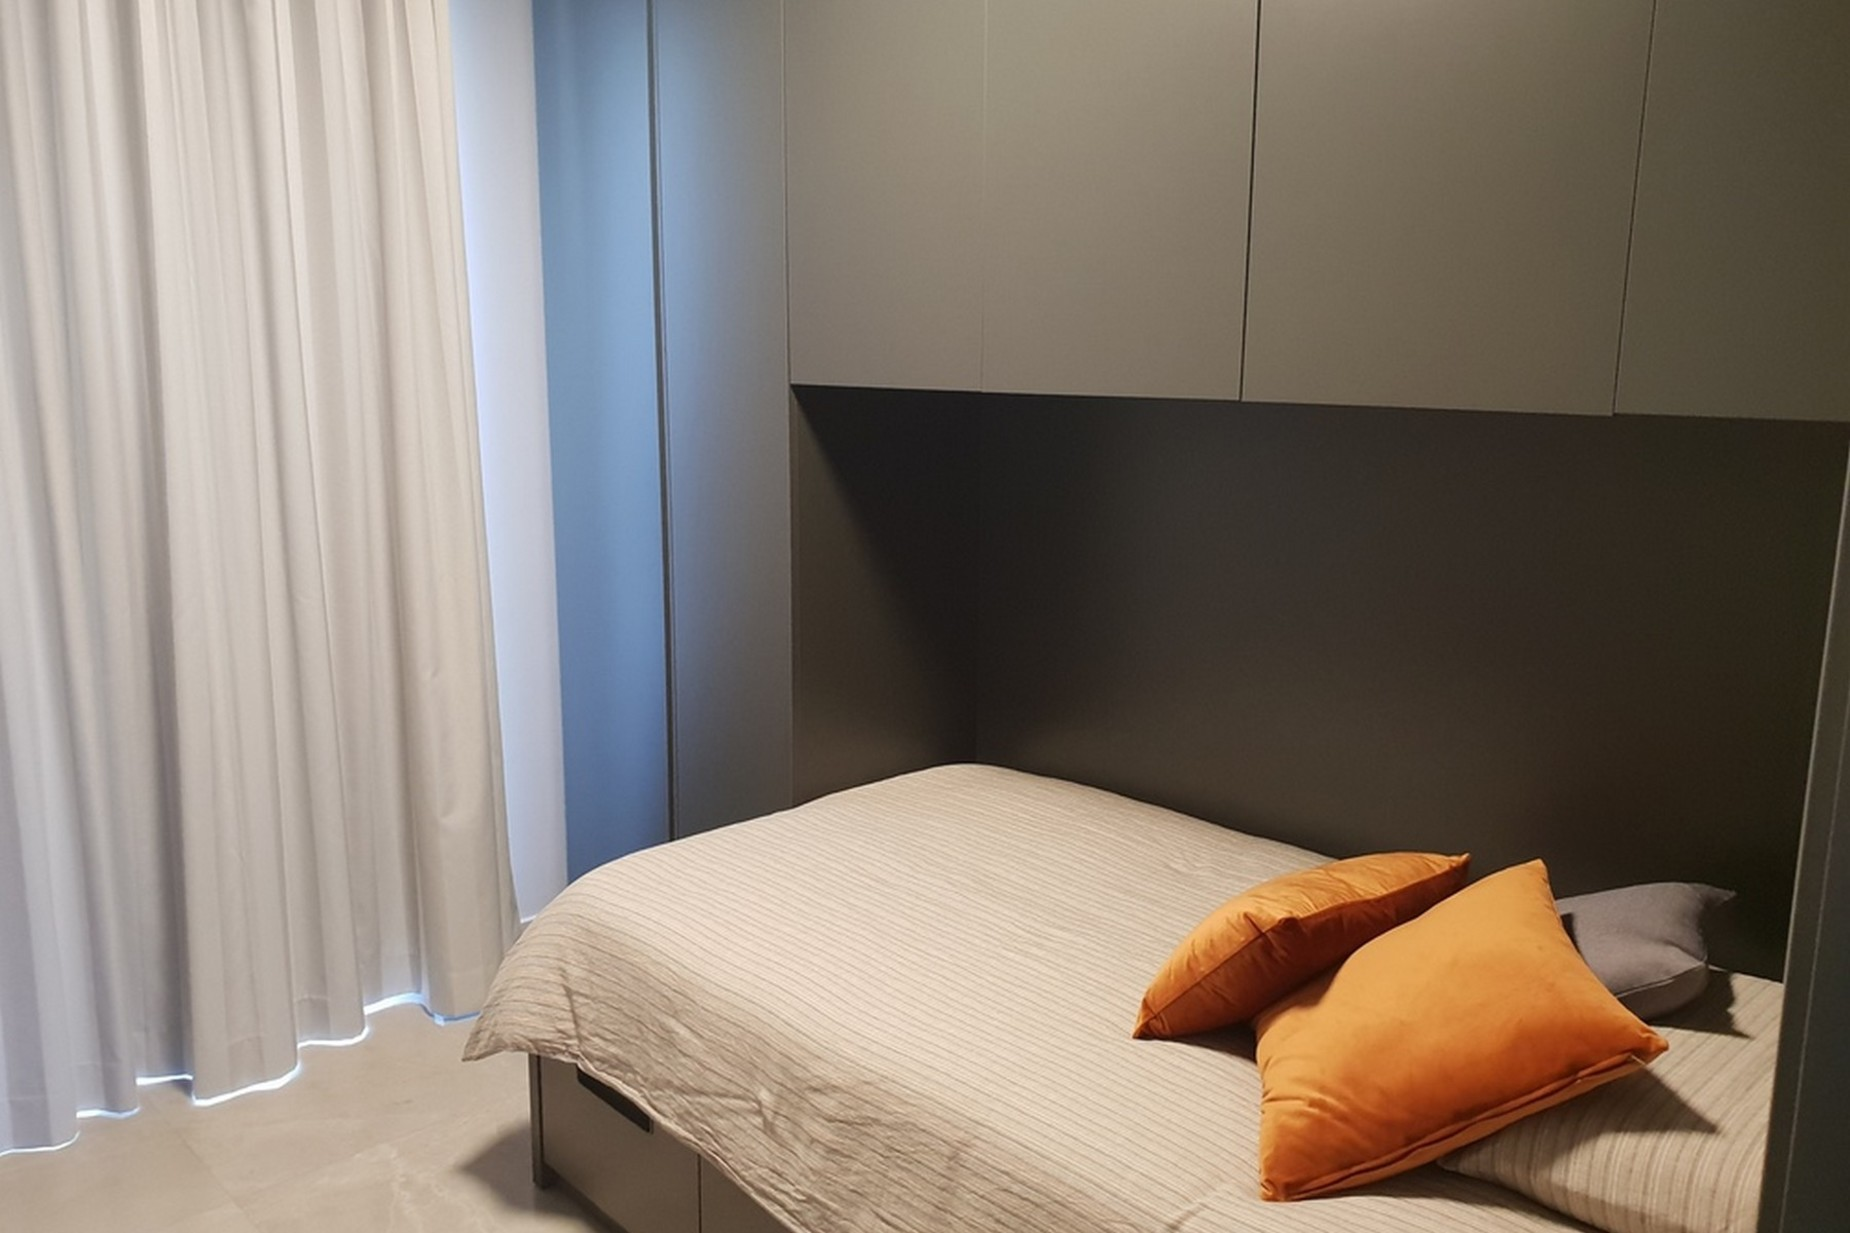 2 bed Apartment For Rent in Birkirkara, Birkirkara - thumb 7